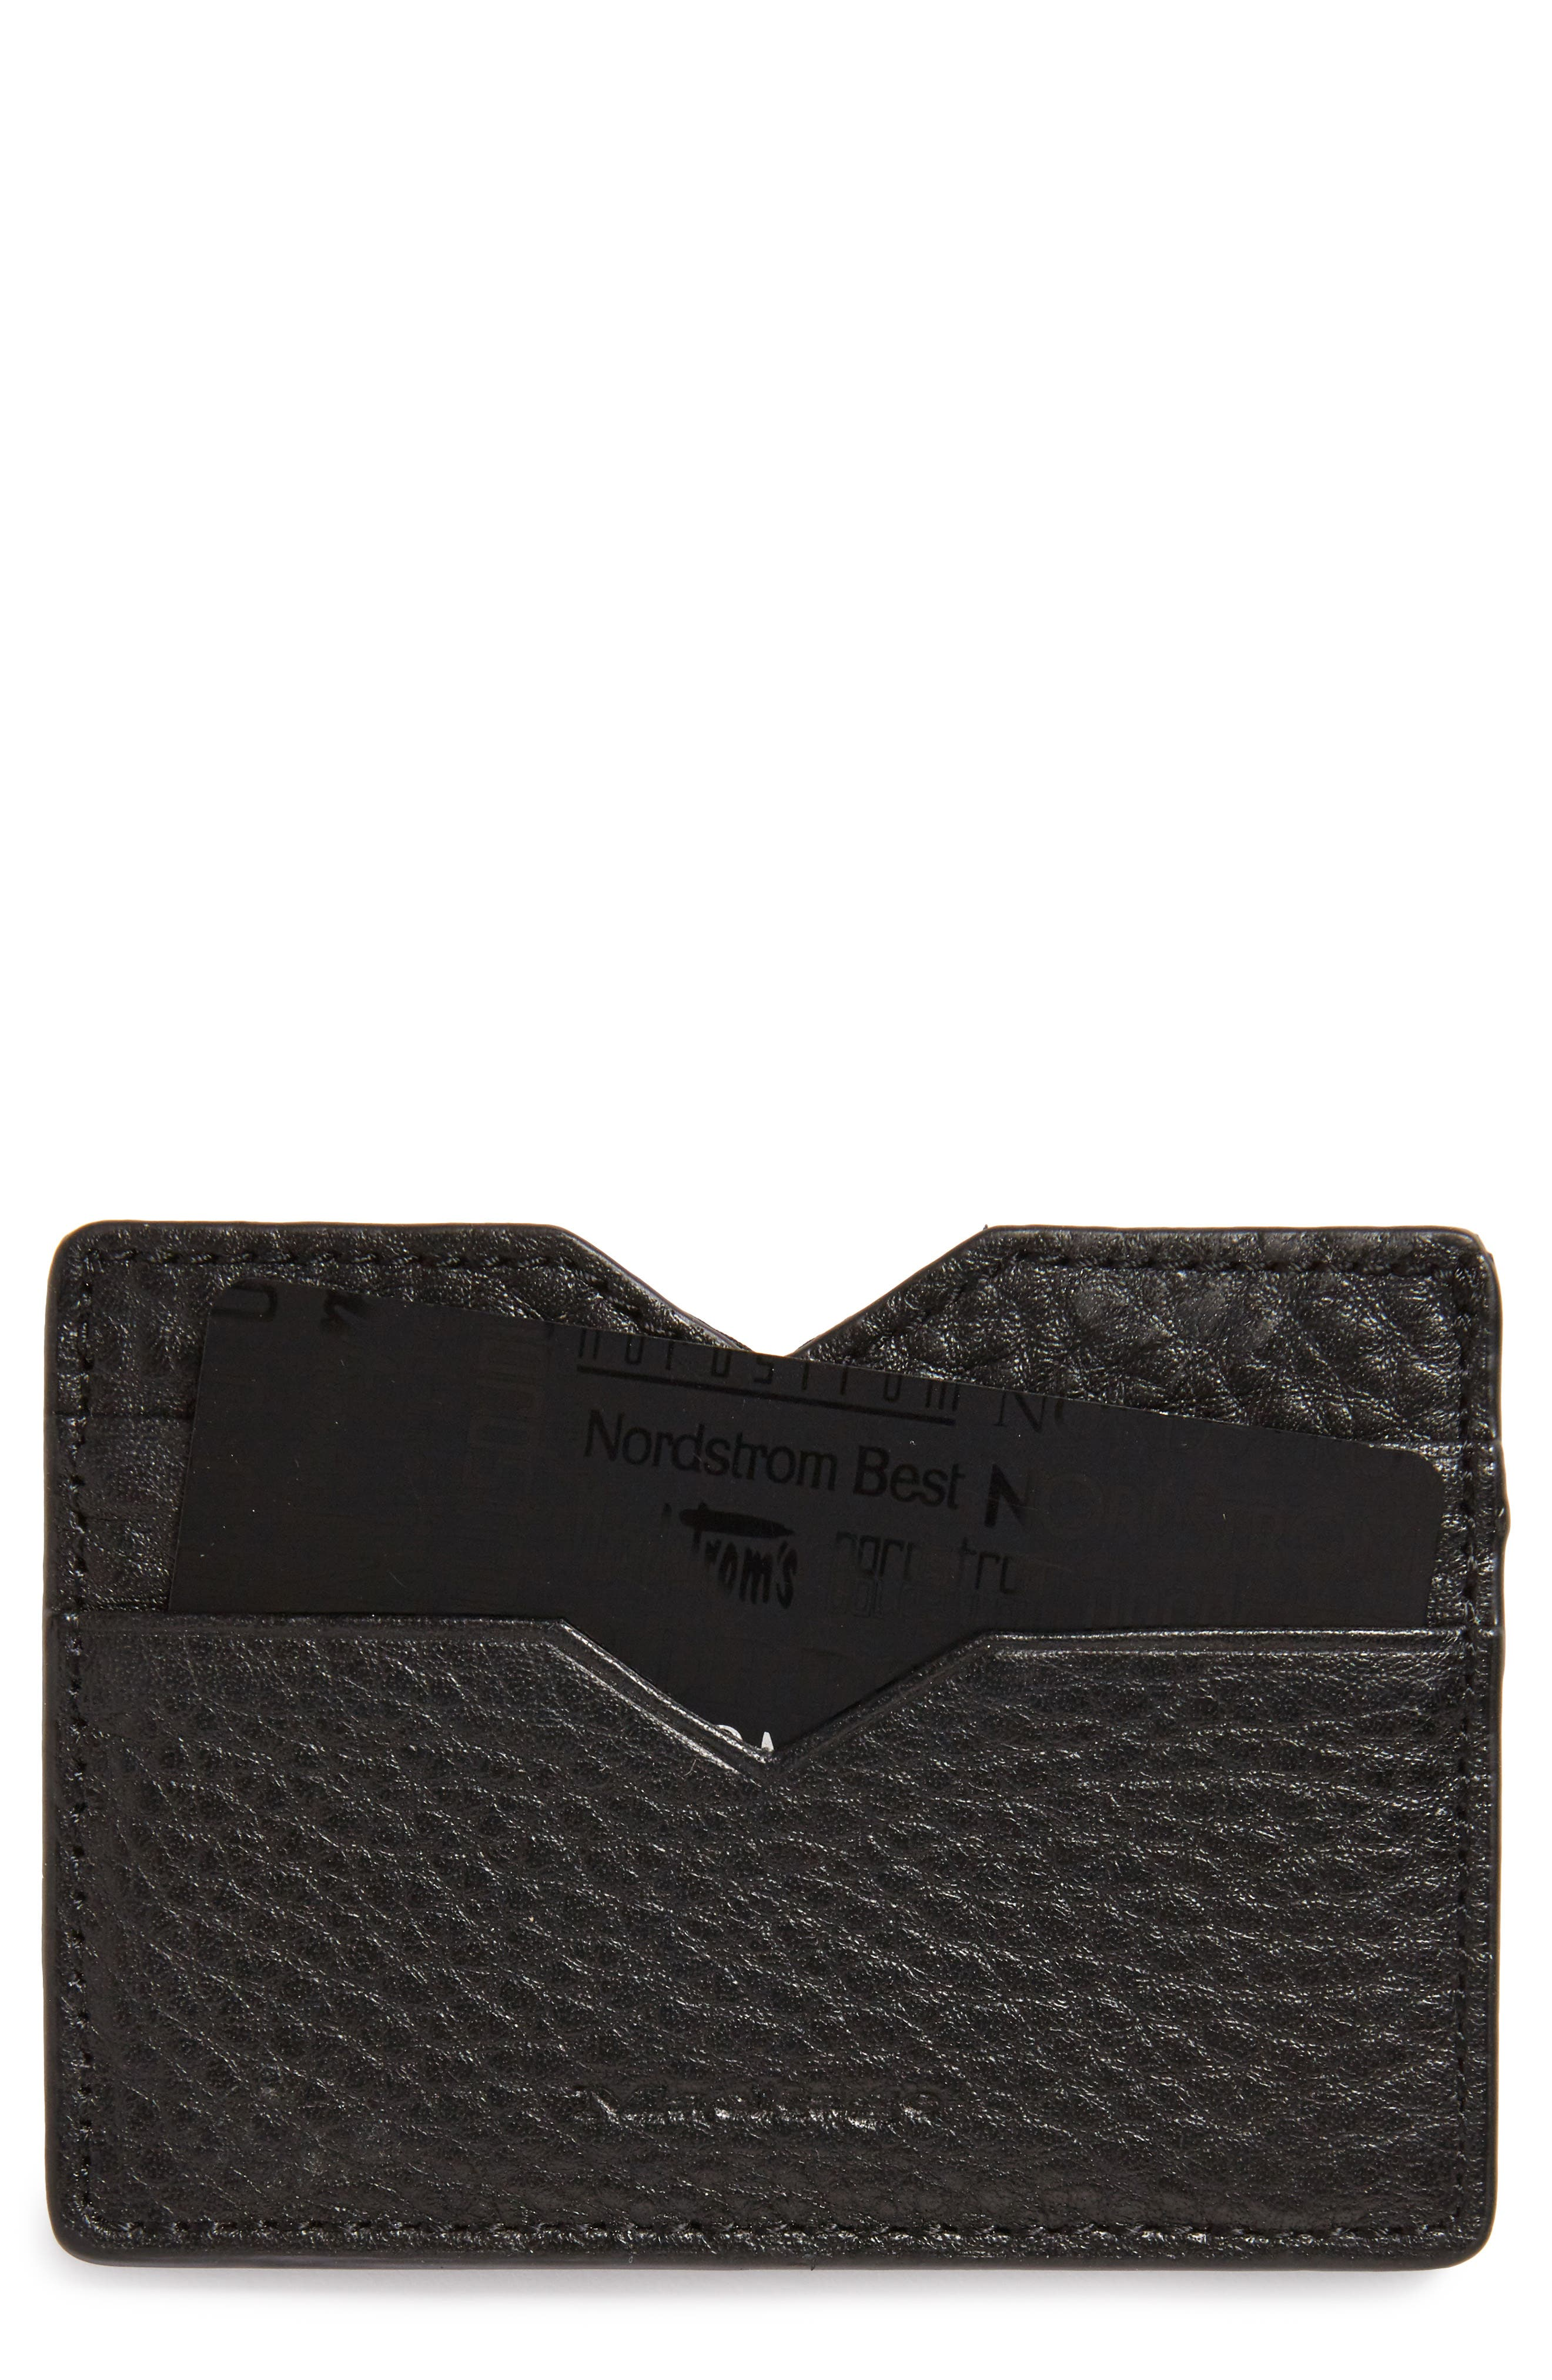 Wes Leather Card Case,                         Main,                         color, Black